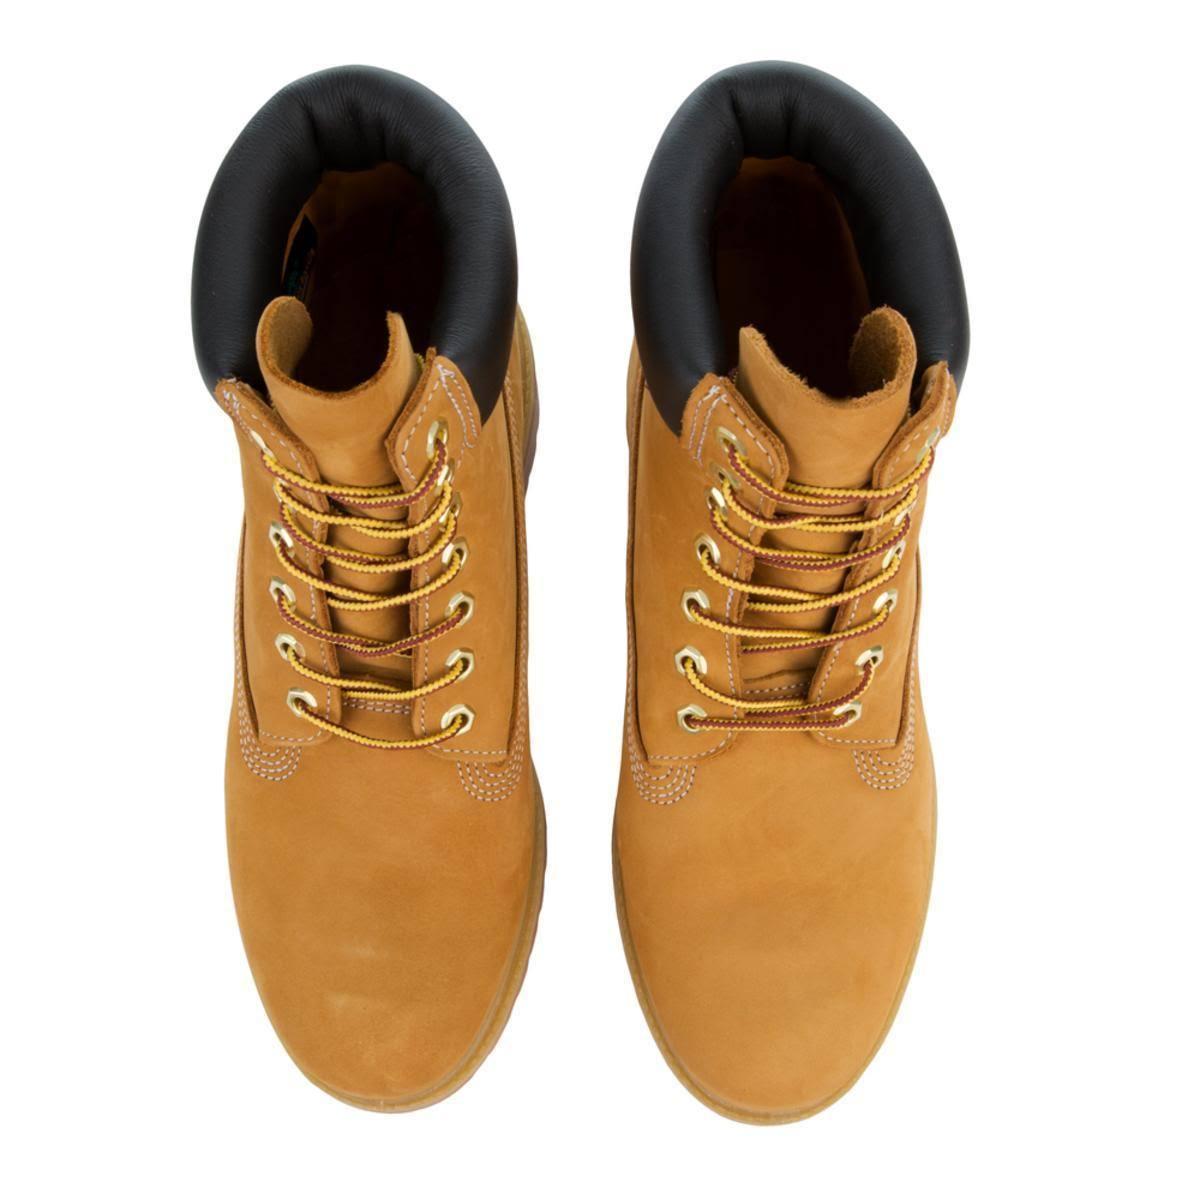 Timberland Men's 7 Premium Tan Classic Boots Upq1UnAS